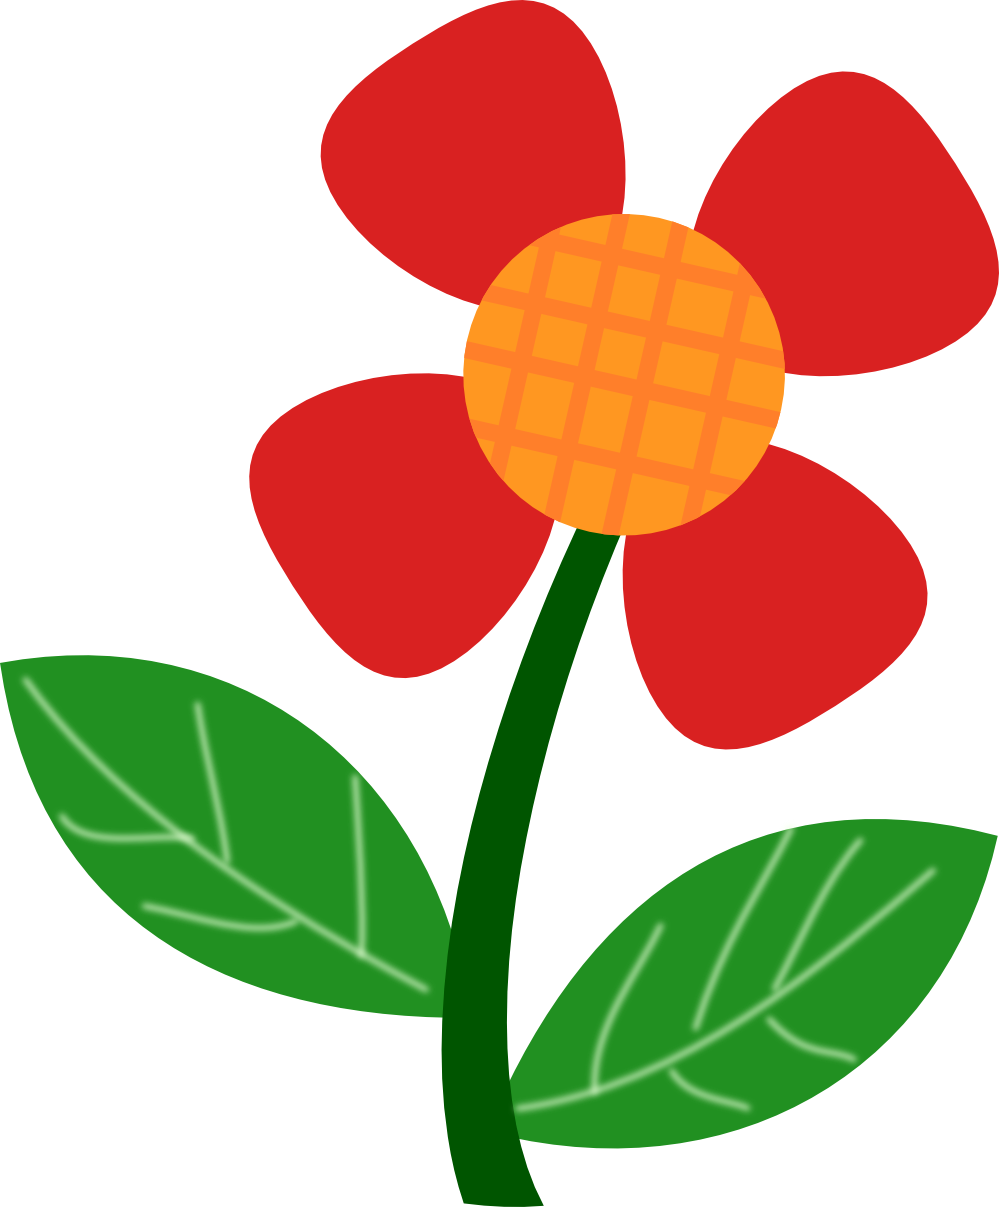 999x1207 Image Of A Flower Clip Art